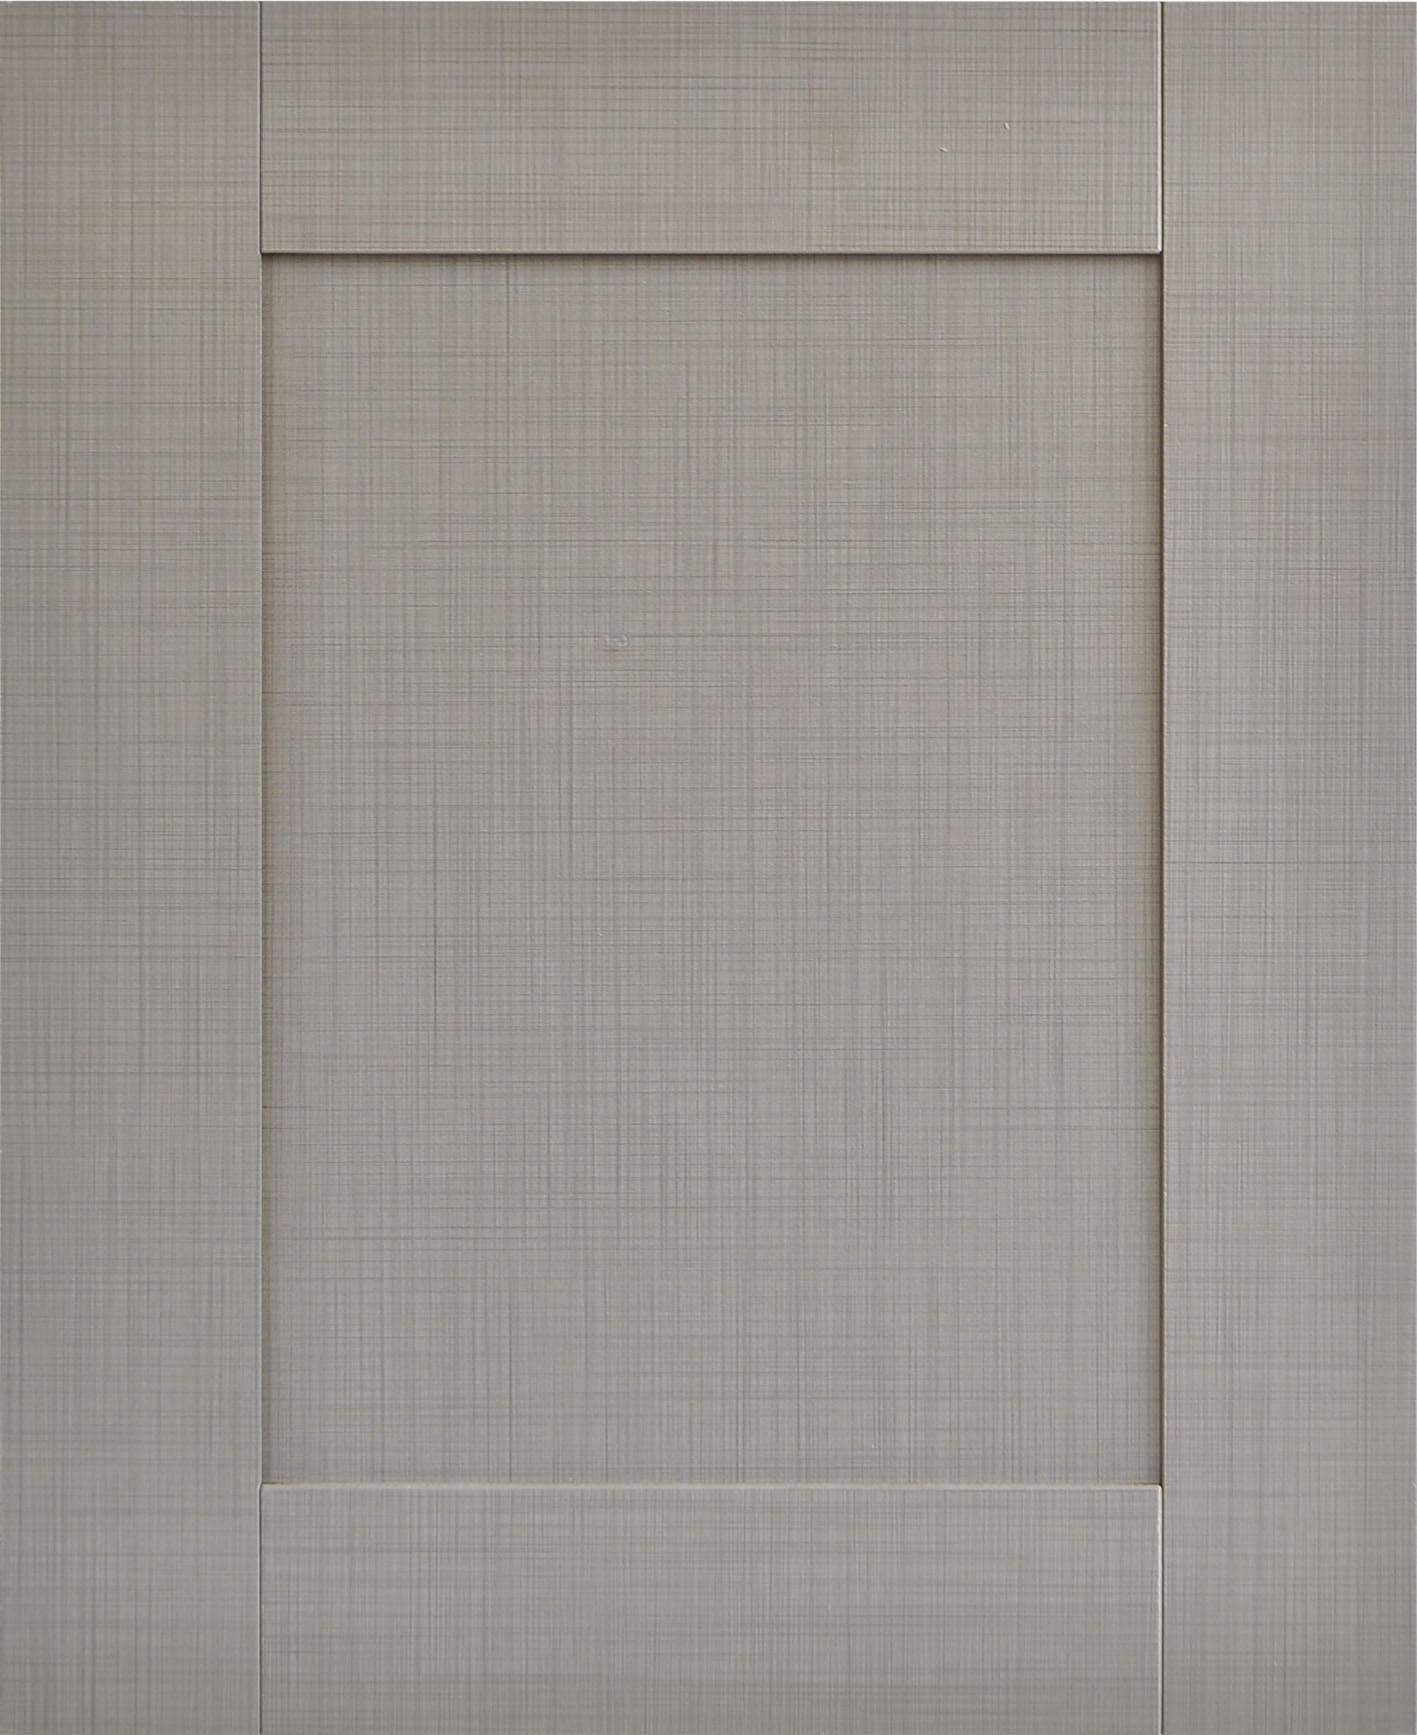 Square Frame 185-SQ